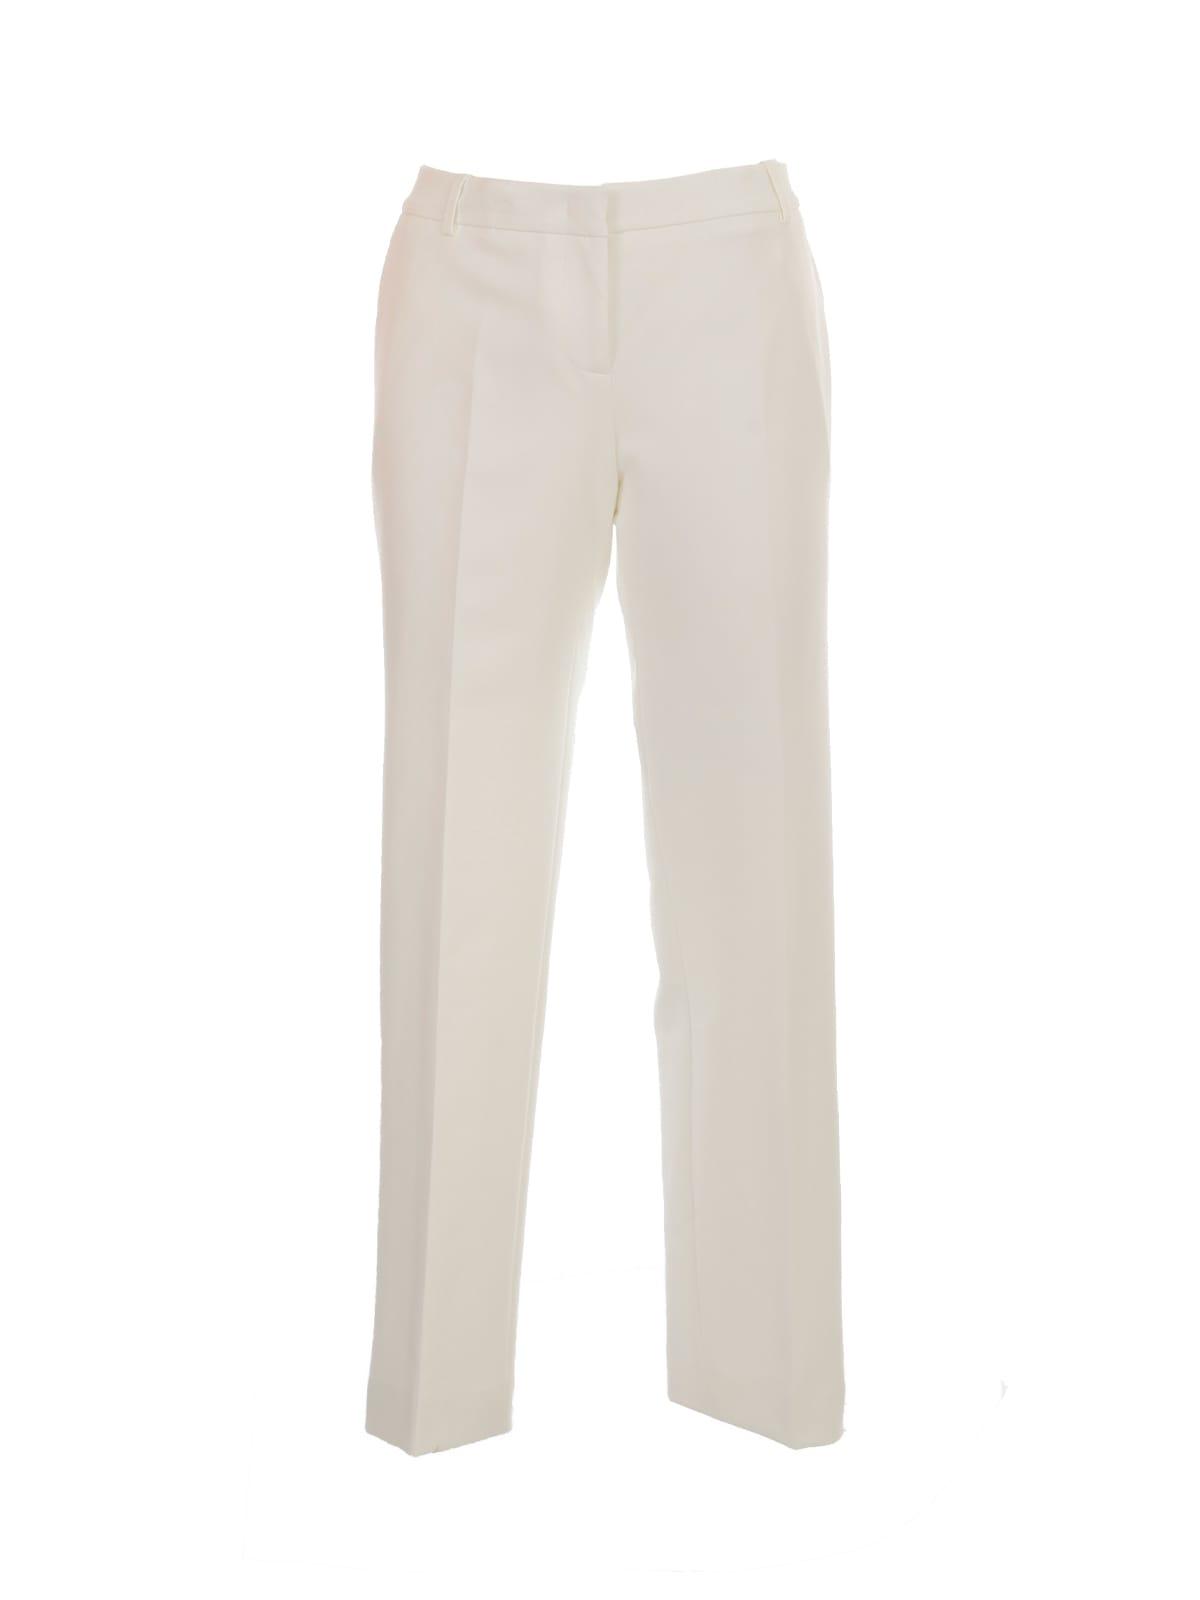 Costes Slim Pants Cotton Bistretch